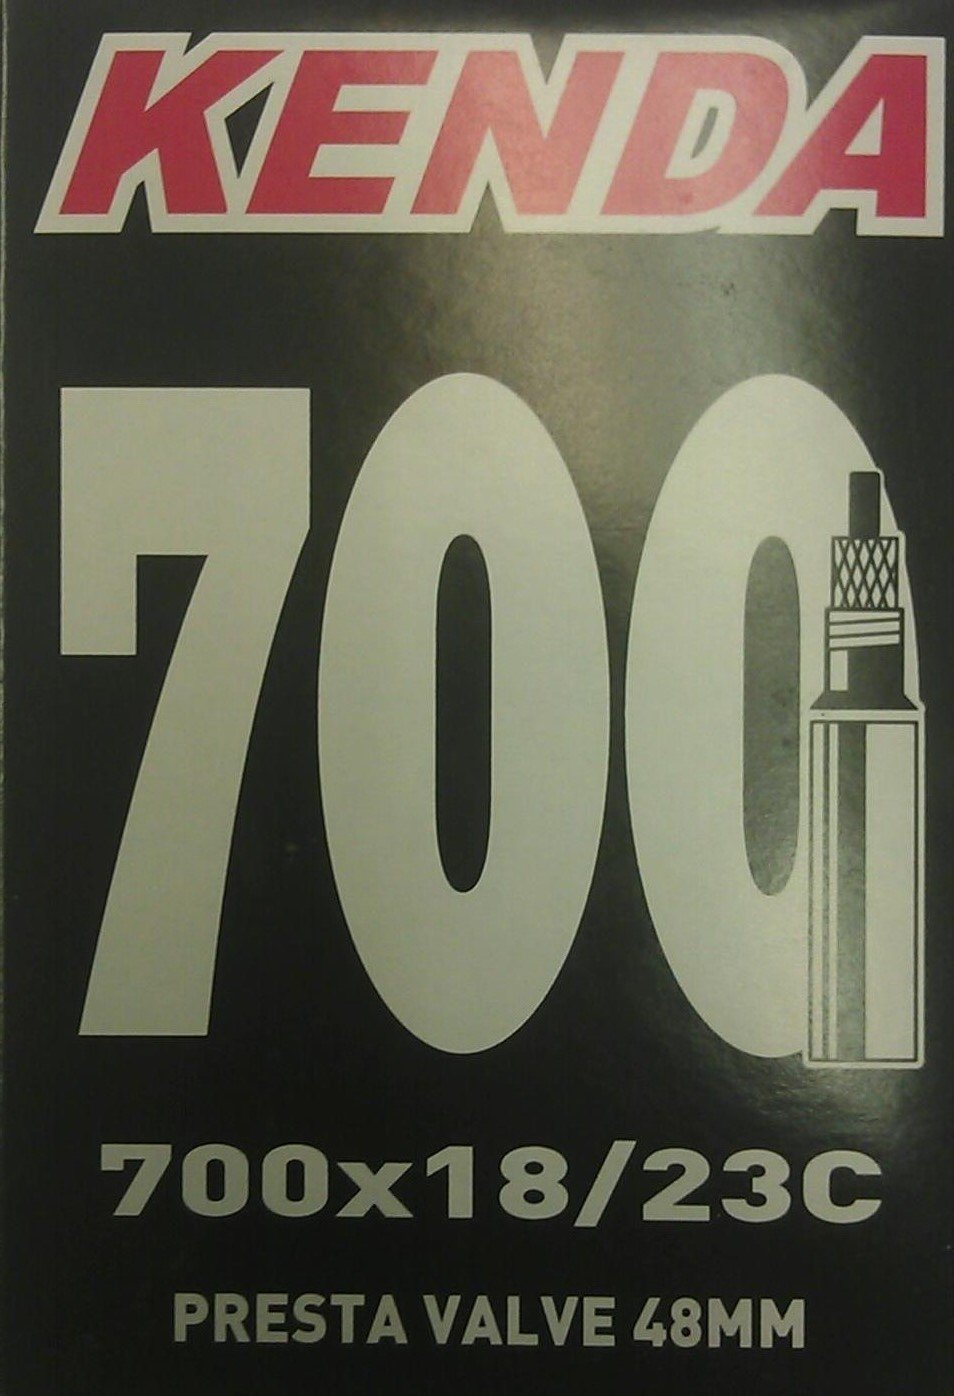 Kenda 700 x 18//23 C with 48 mm valve Tube Presta Cycle Force Group KE02289130